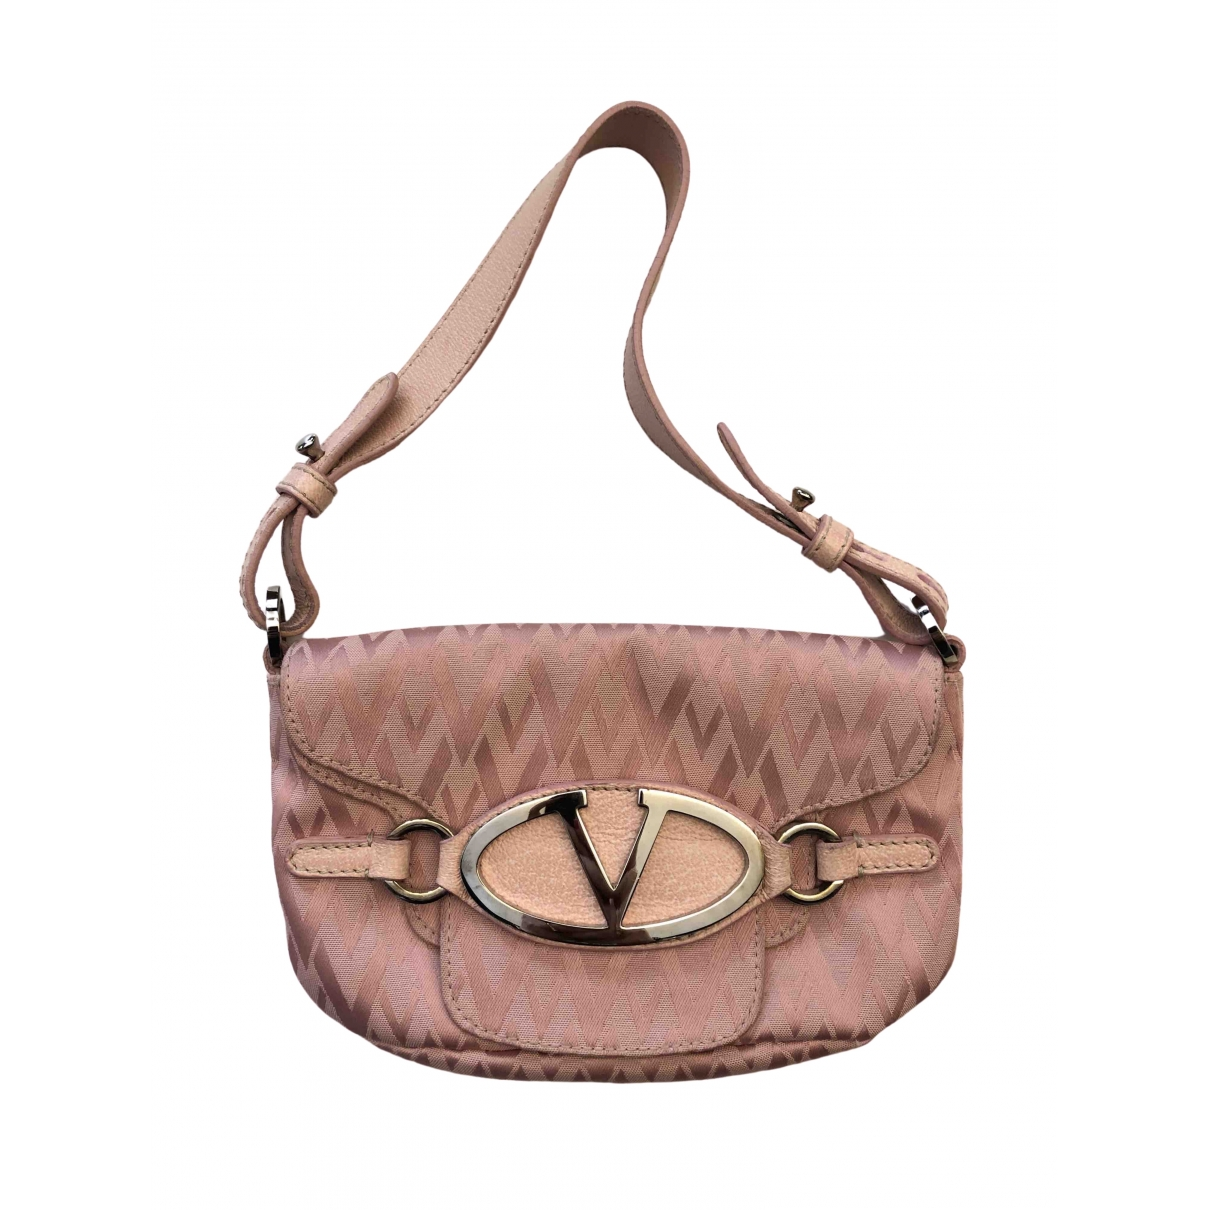 Valentino Garavani \N Pink Cotton handbag for Women \N